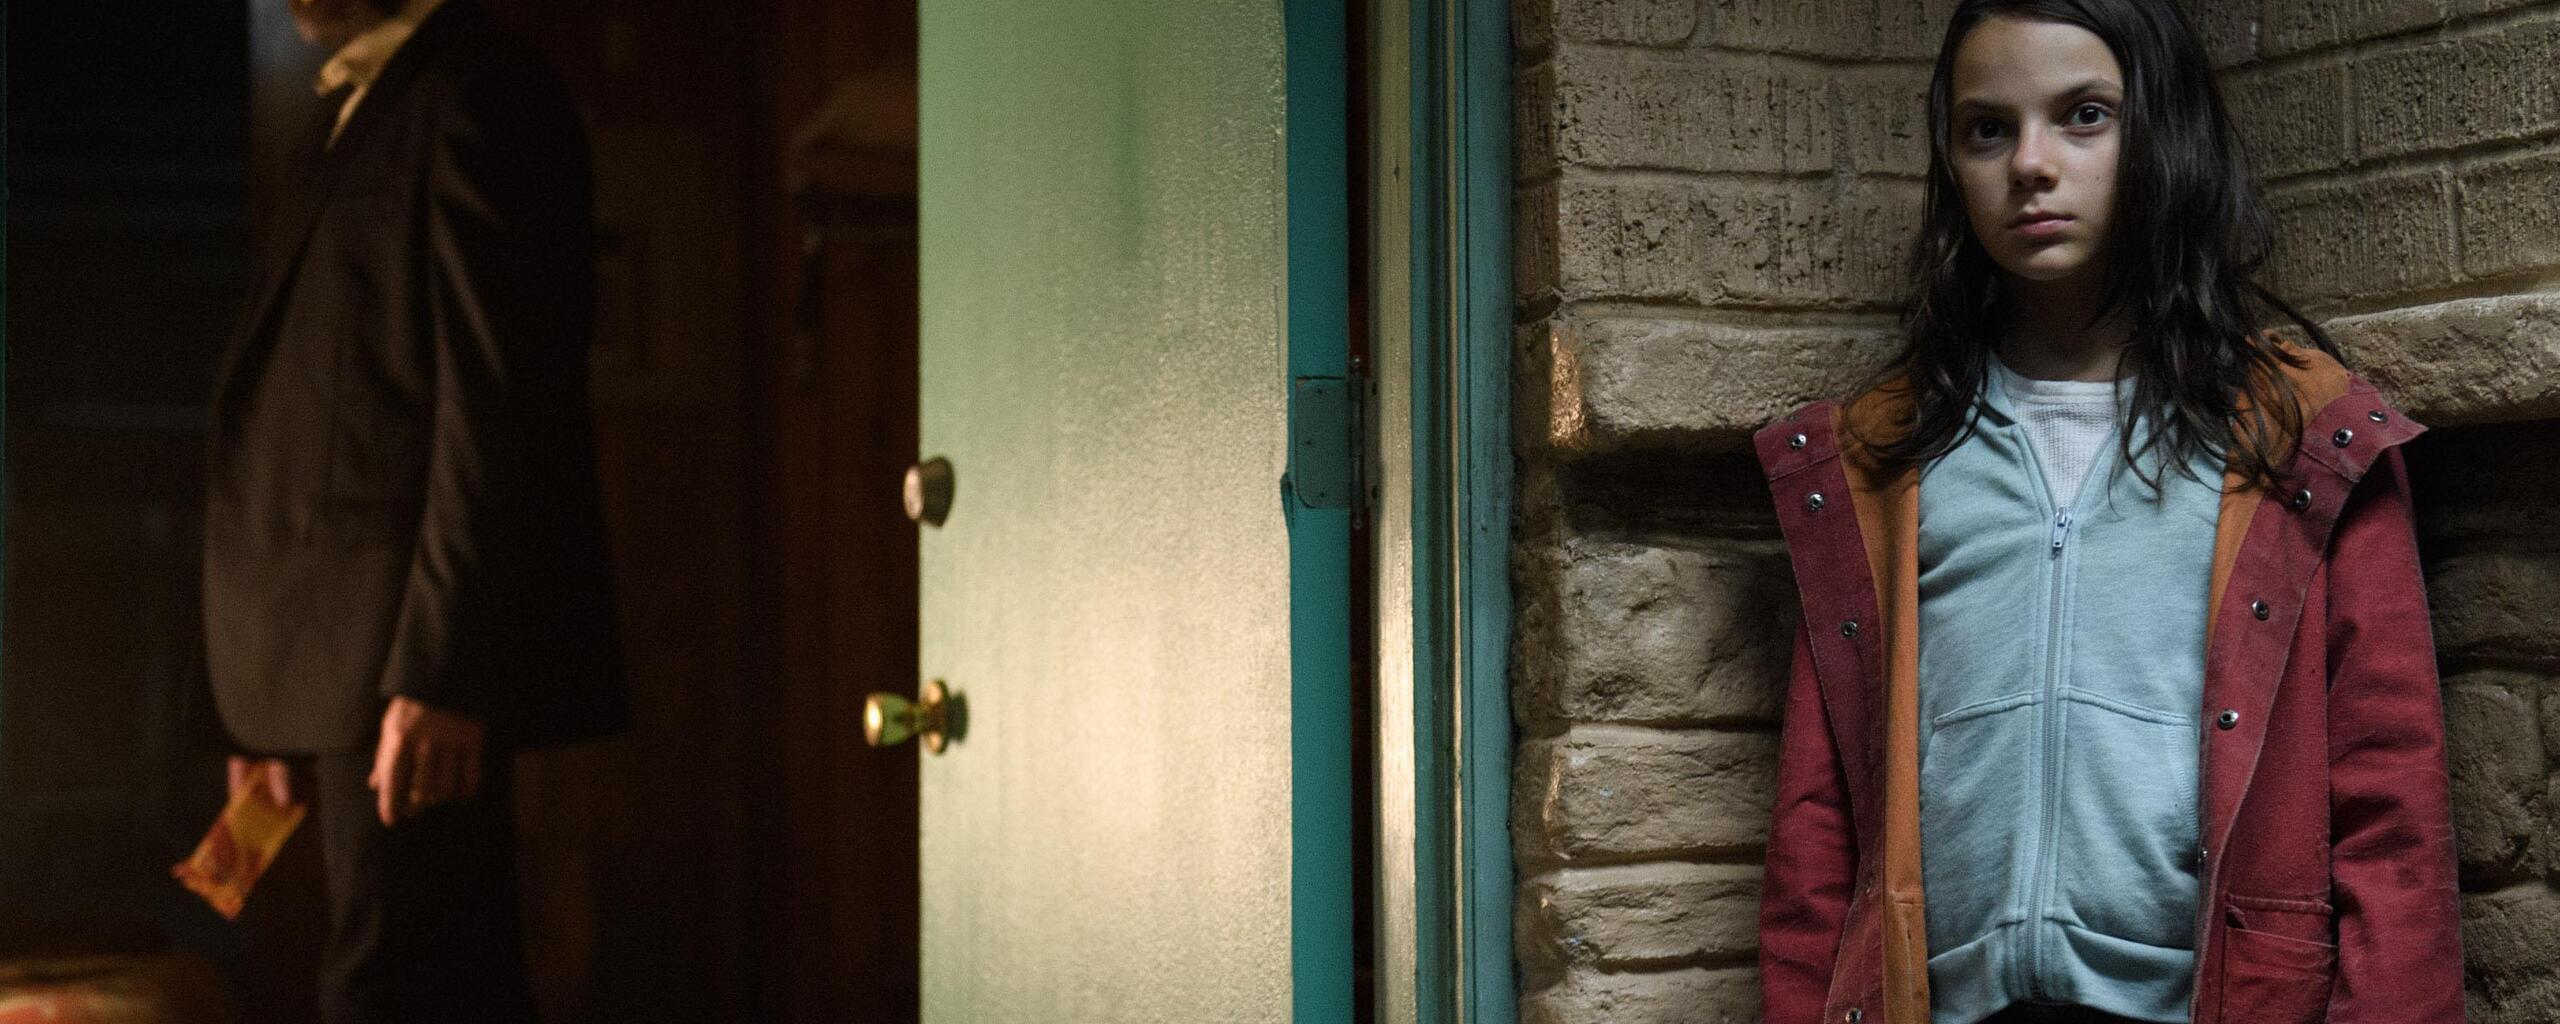 hugh-jackman-laura-kinney-logan-movie-img.jpg